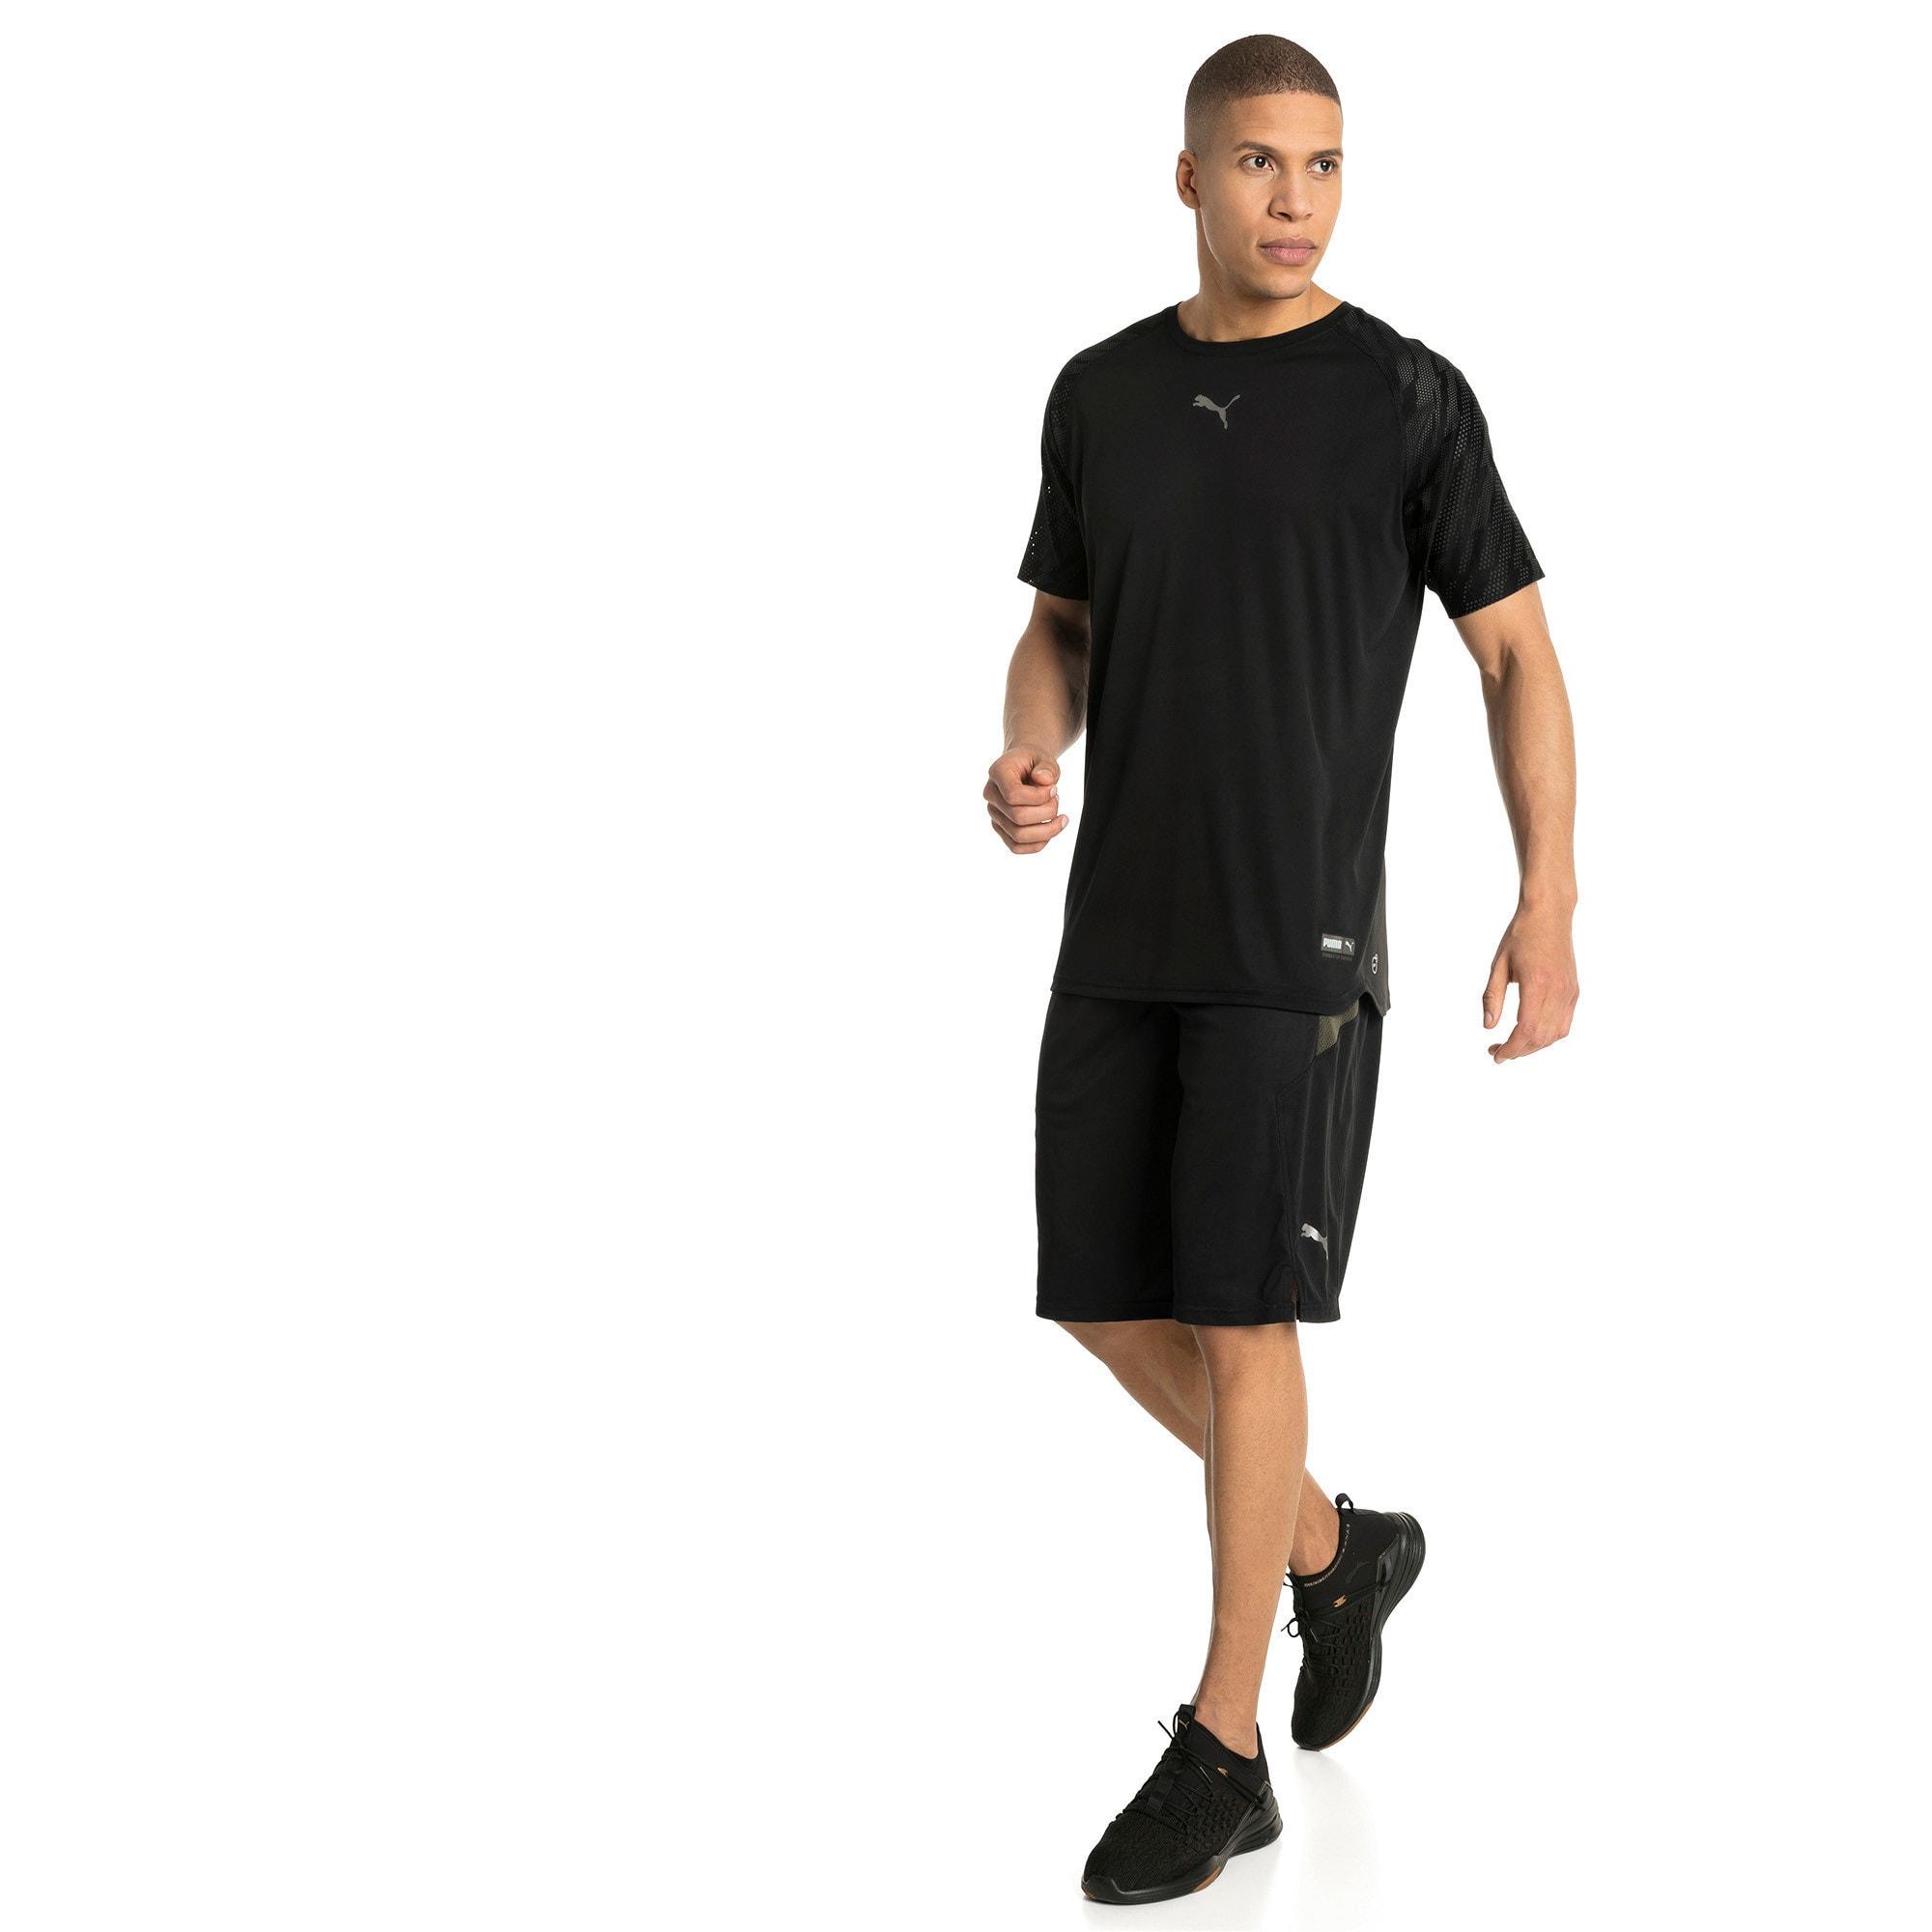 Thumbnail 3 of VENT Graphic Men's T-Shirt, Puma Black-iron gate, medium-IND